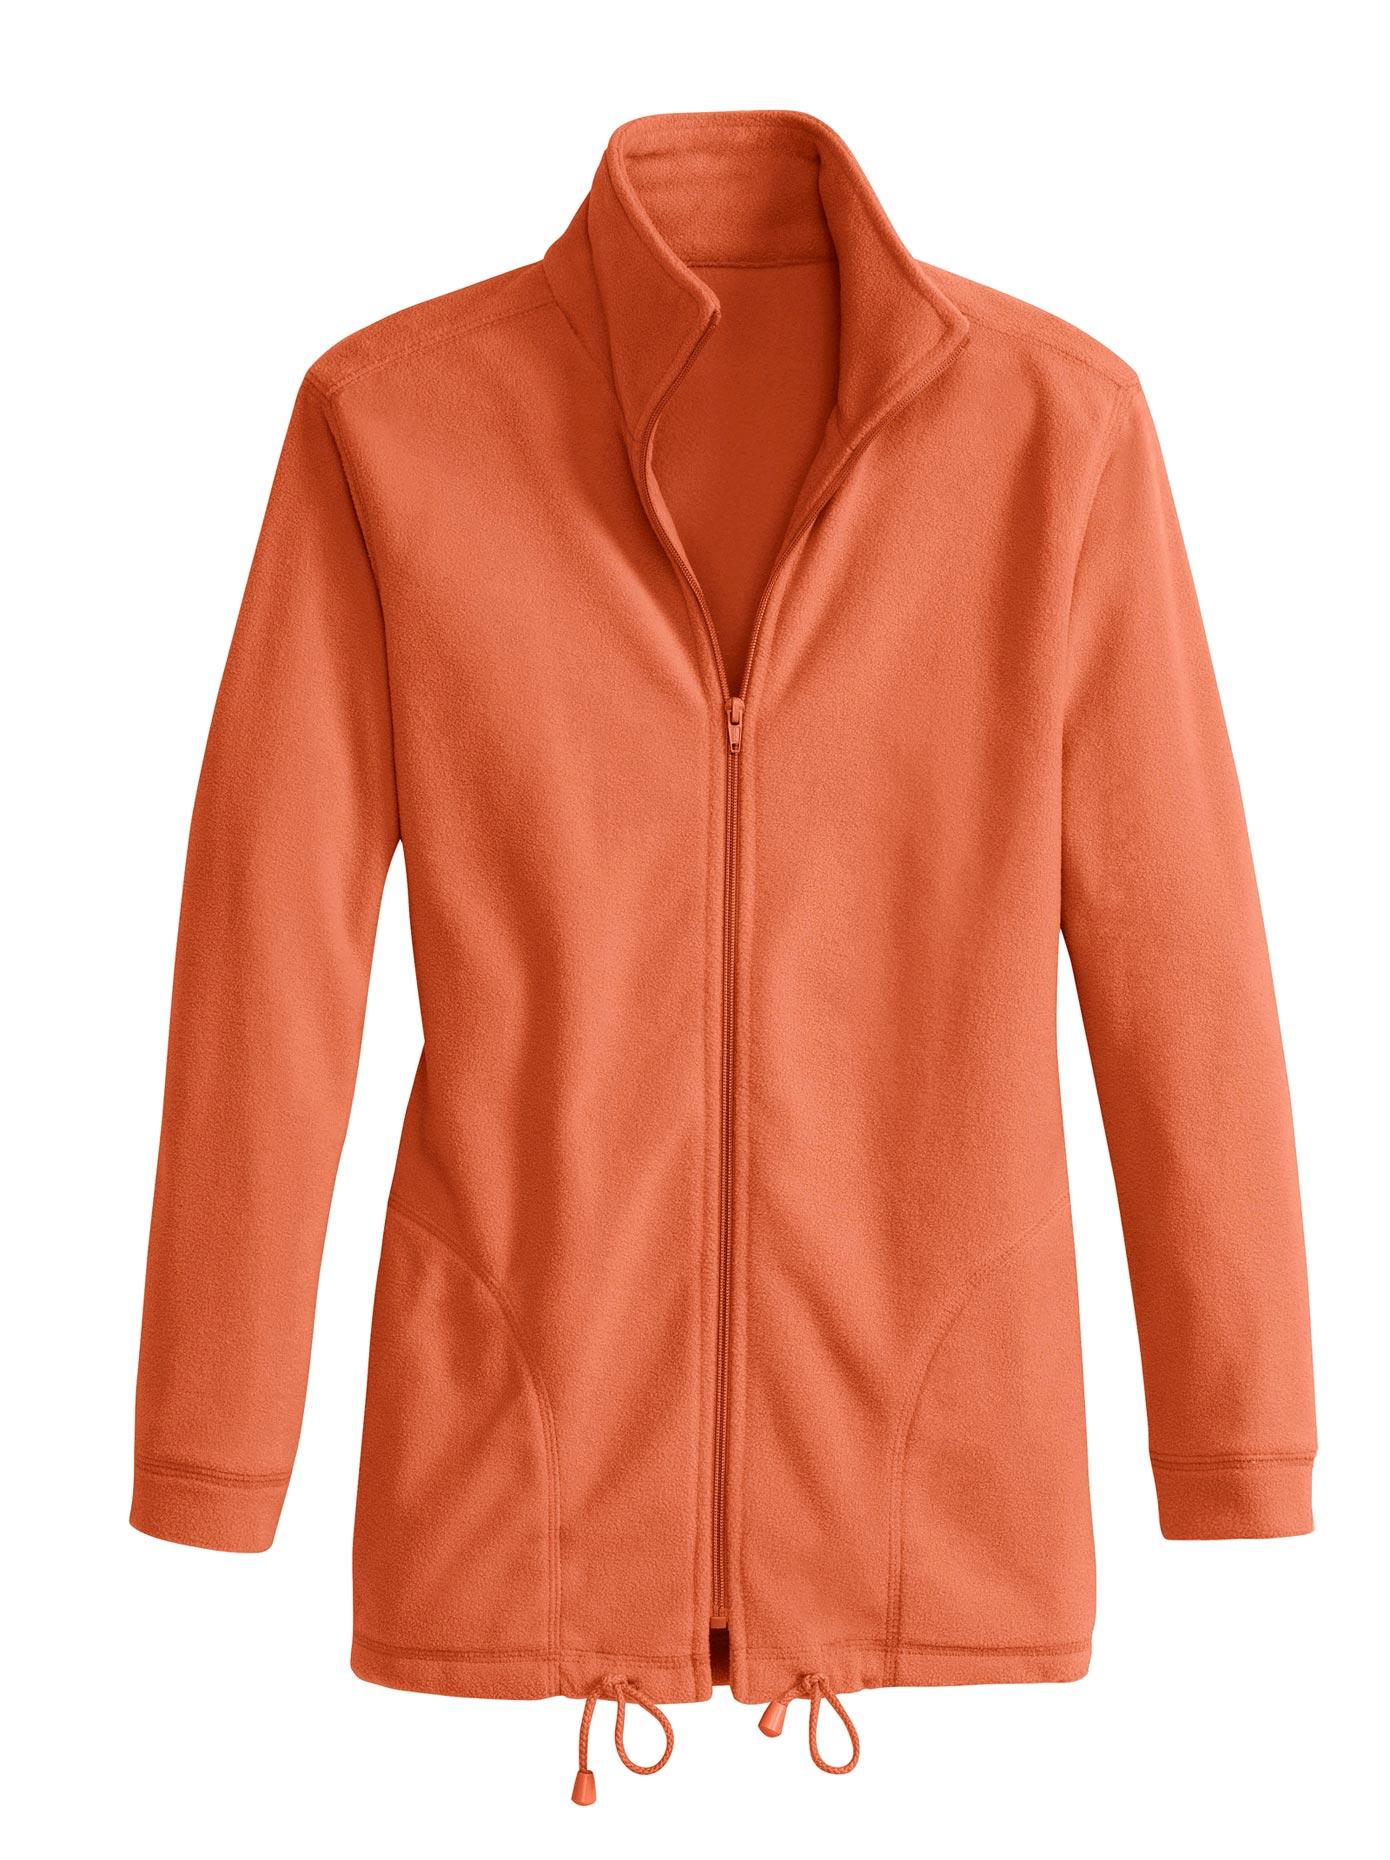 Casual Looks Fleece-Jacke orange Damen Fleecejacken Jacken